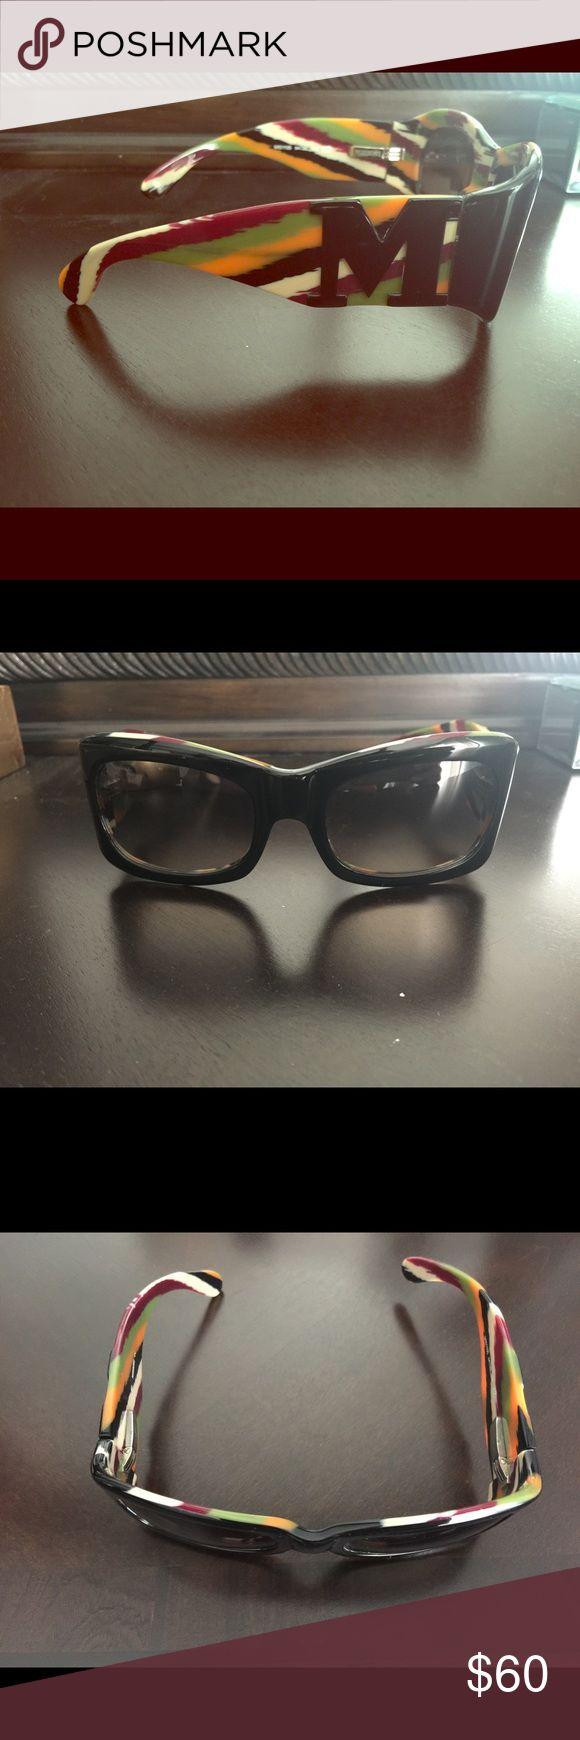 Vintage MISSONI sunglasses Vintage MISSONI sunglasses. Excellent vintage condition. Tiny scratch on the front of the bottom left frame - not noticeable. Missoni Accessories Sunglasses